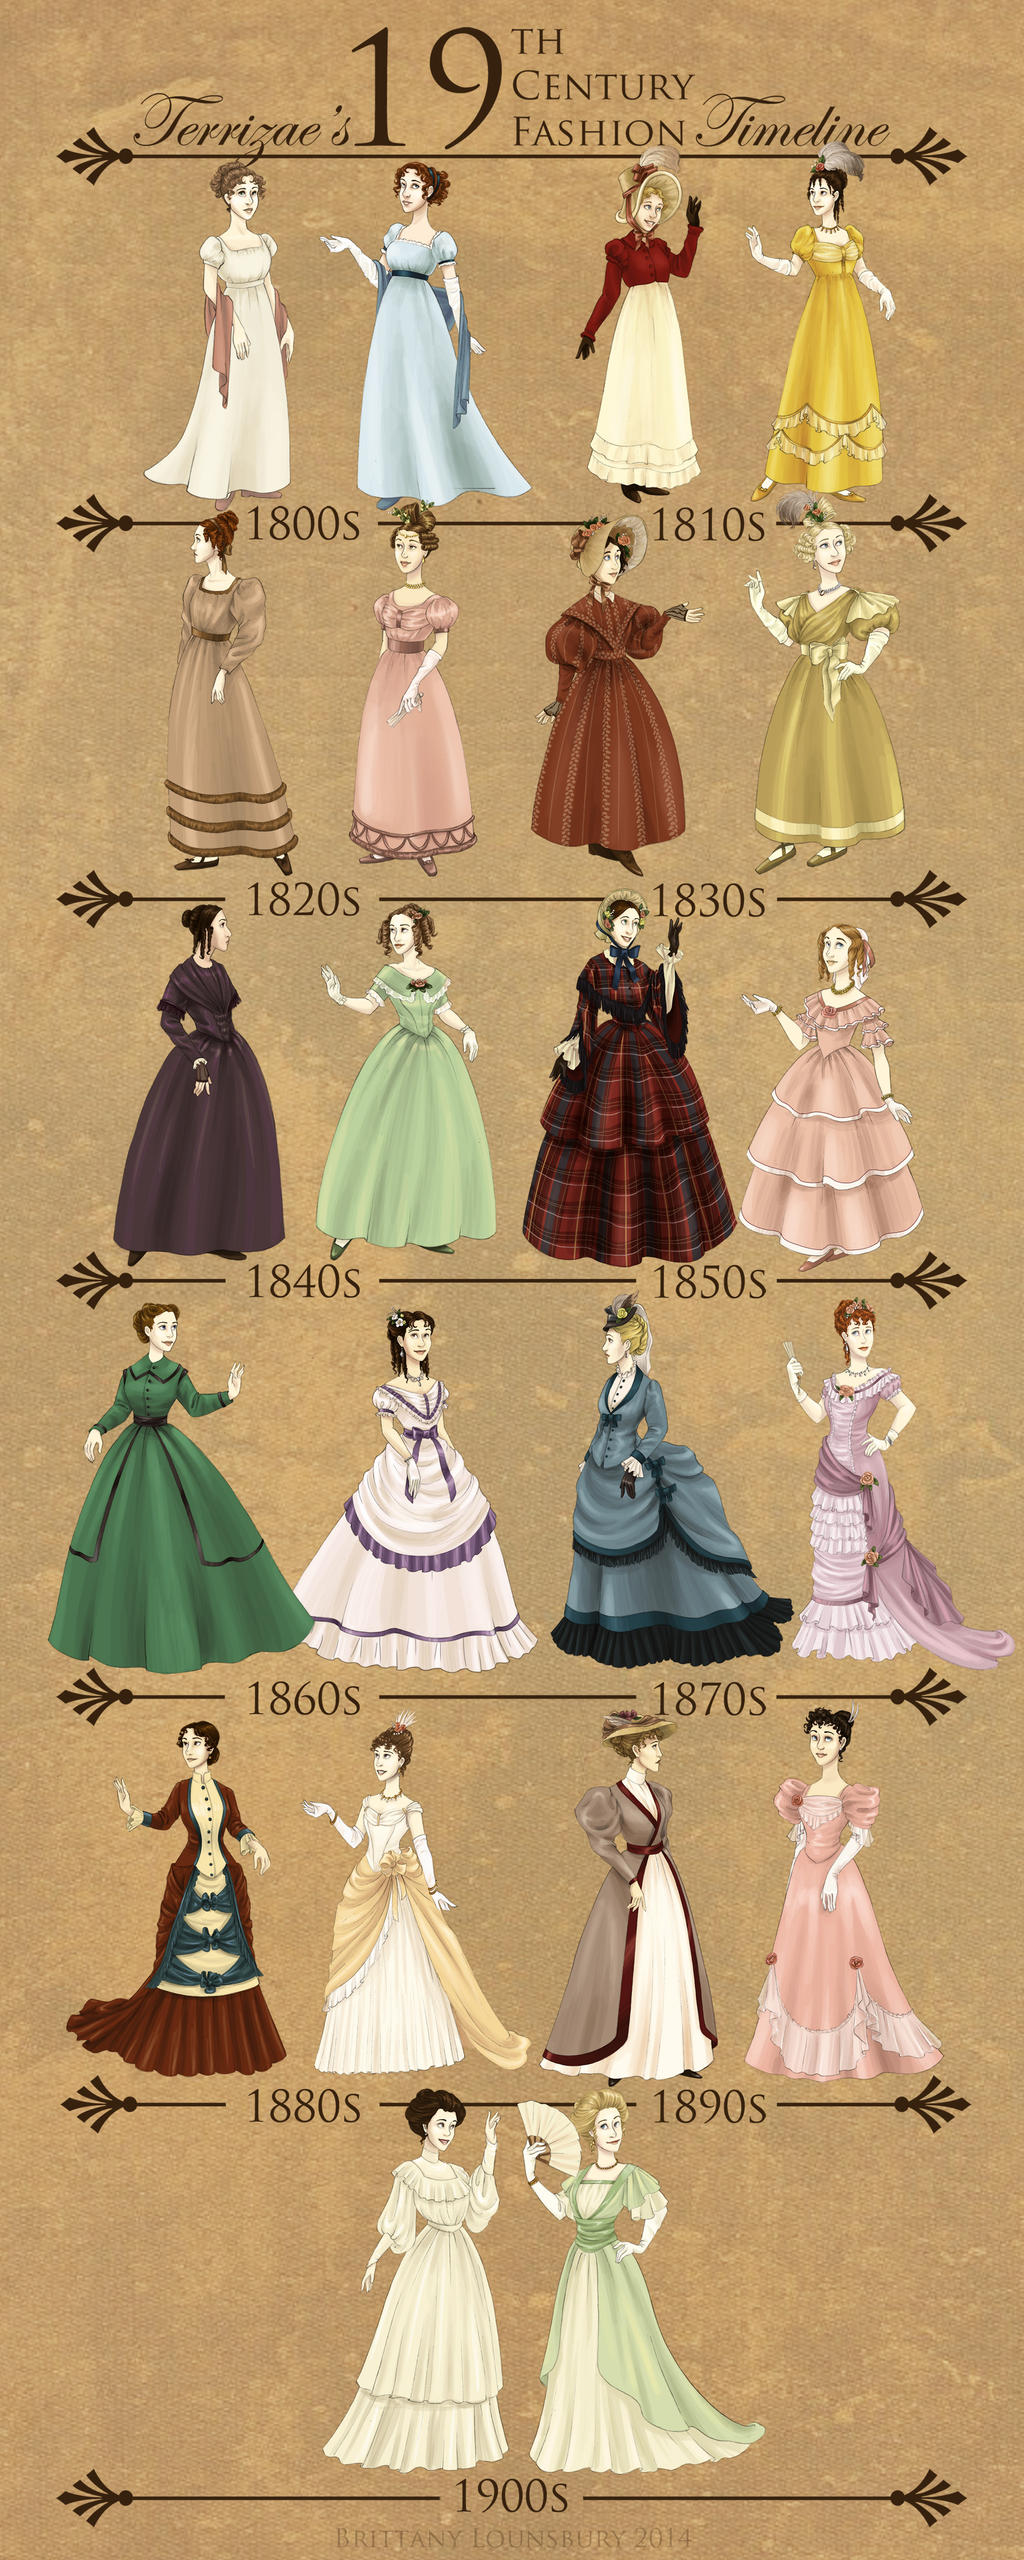 19th Century Fashion Timeline by Terrizae